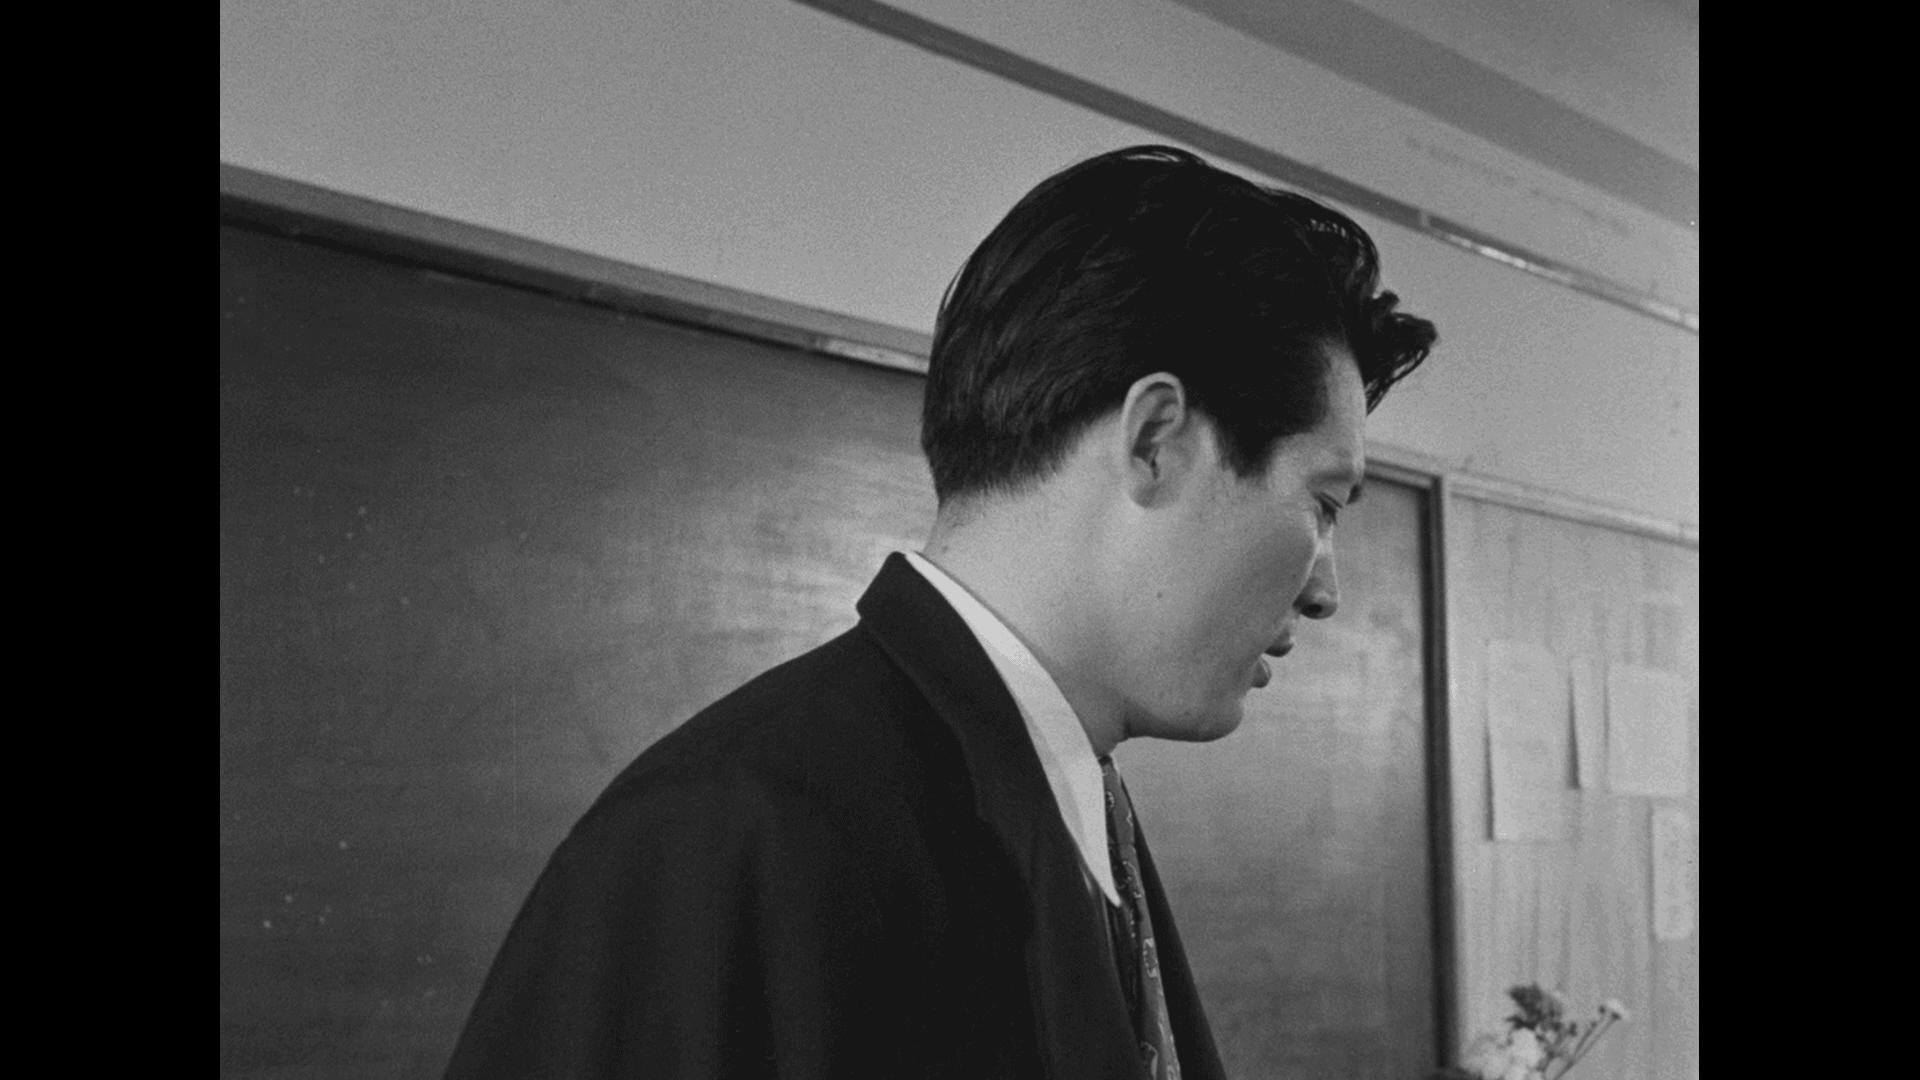 Hiroshima [Arrow Films Blu-ray review] 4